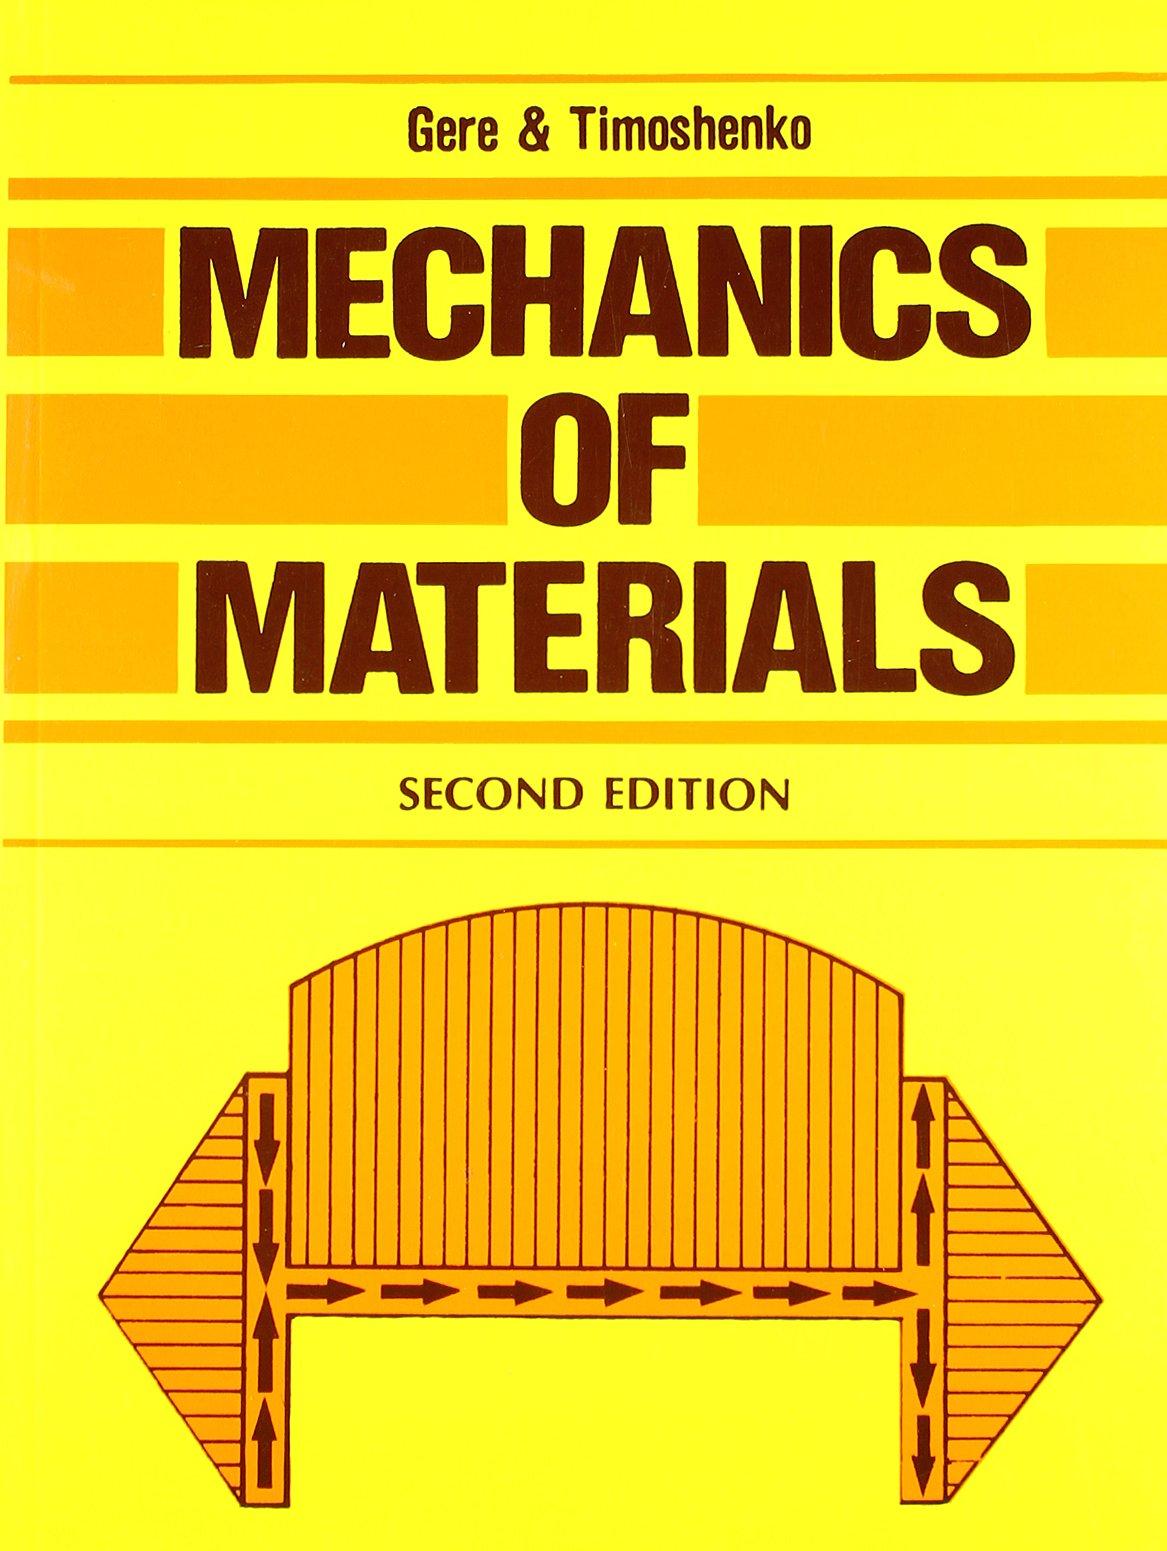 Buy Mechanics of Materials Book Online at Low Prices in India | Mechanics  of Materials Reviews & Ratings - Amazon.in